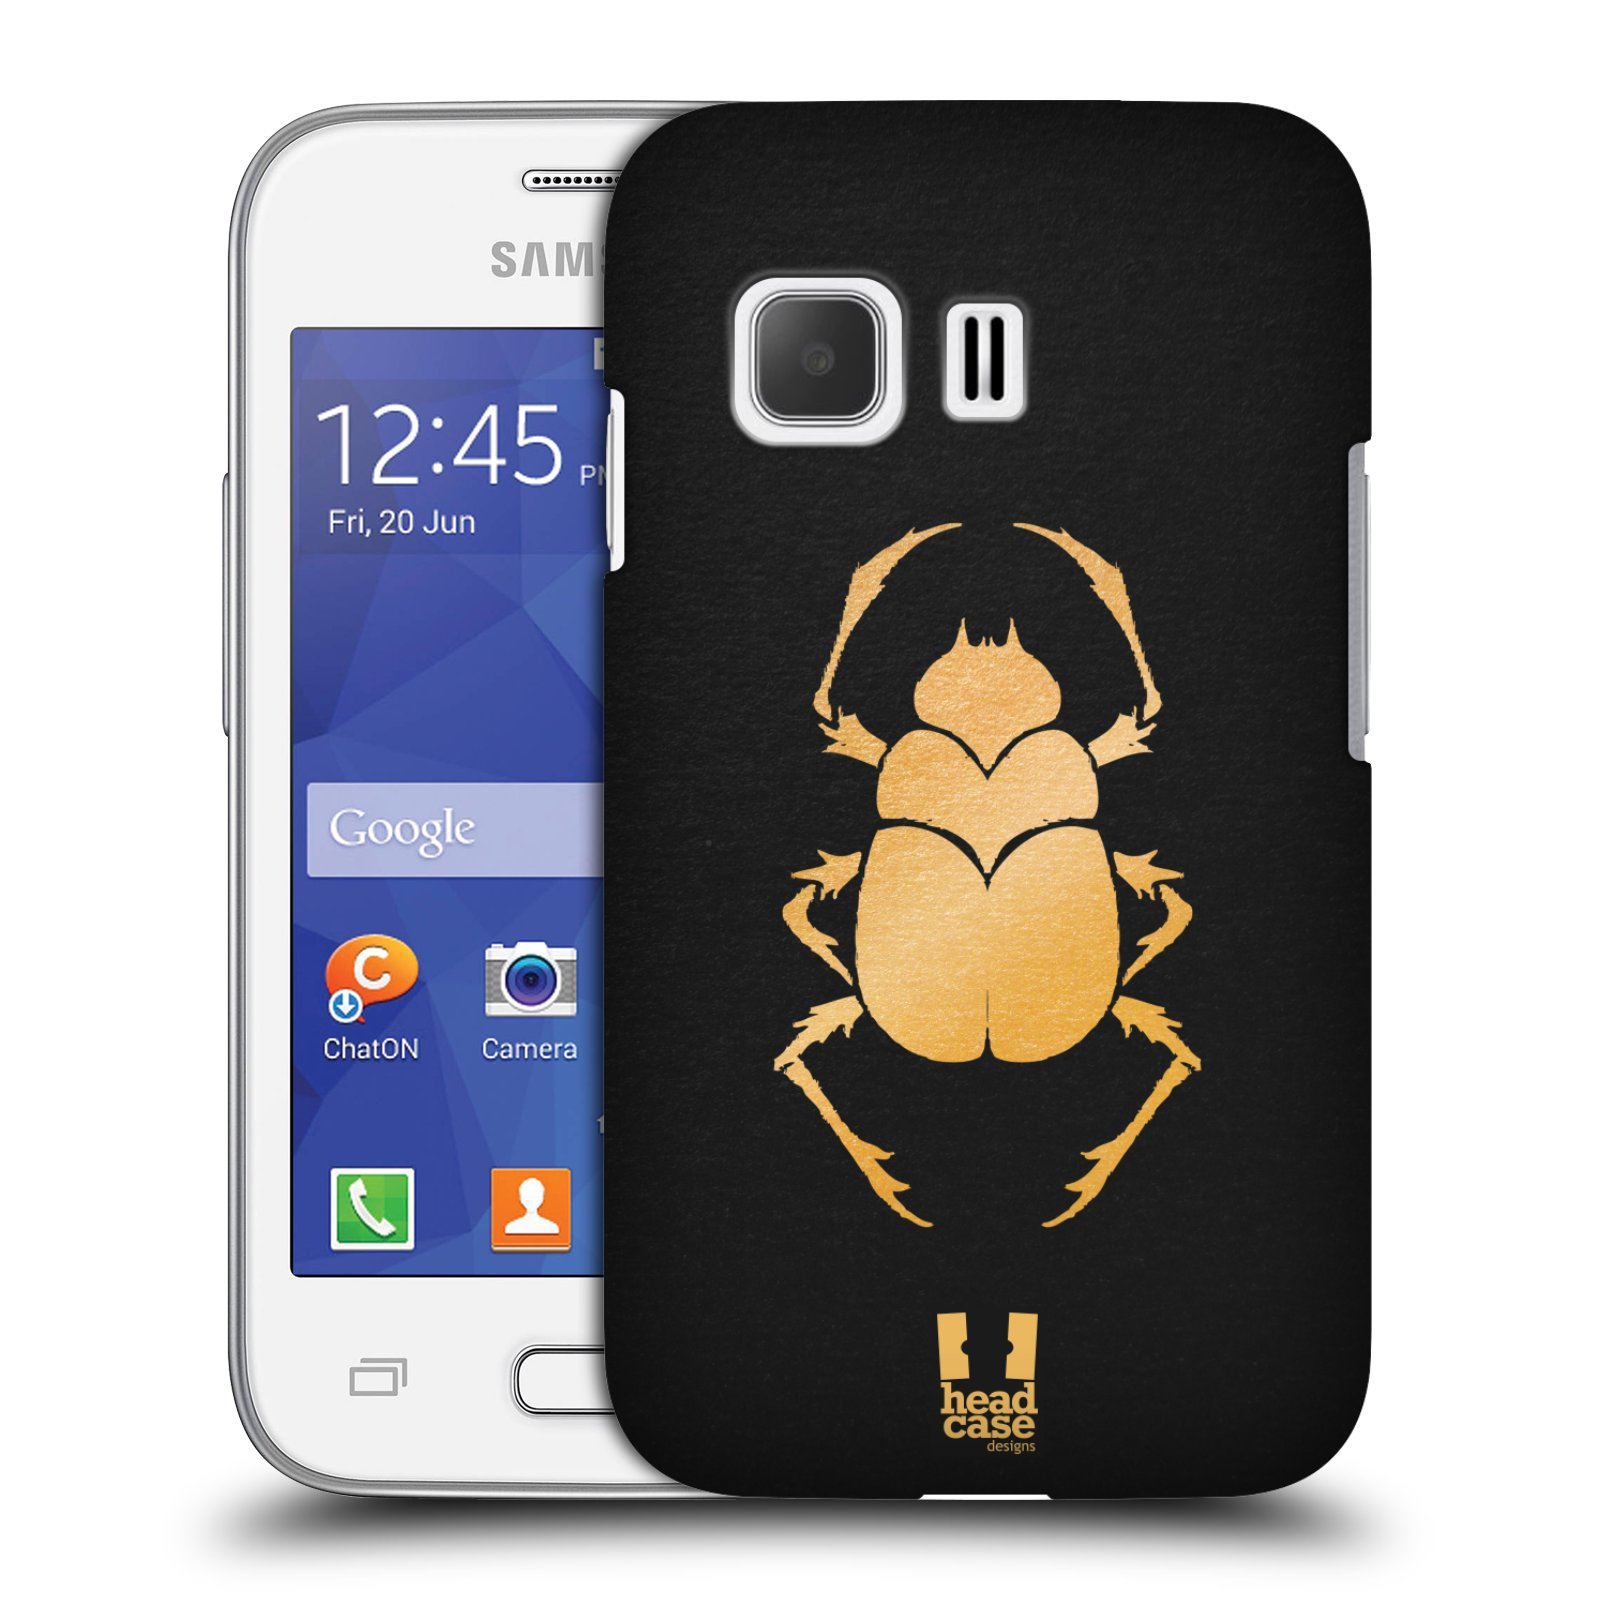 Plastové pouzdro na mobil Samsung Galaxy Young 2 HEAD CASE EGYPT SCARABEUS (Kryt či obal na mobilní telefon Samsung Galaxy Young 2 SM-G130)